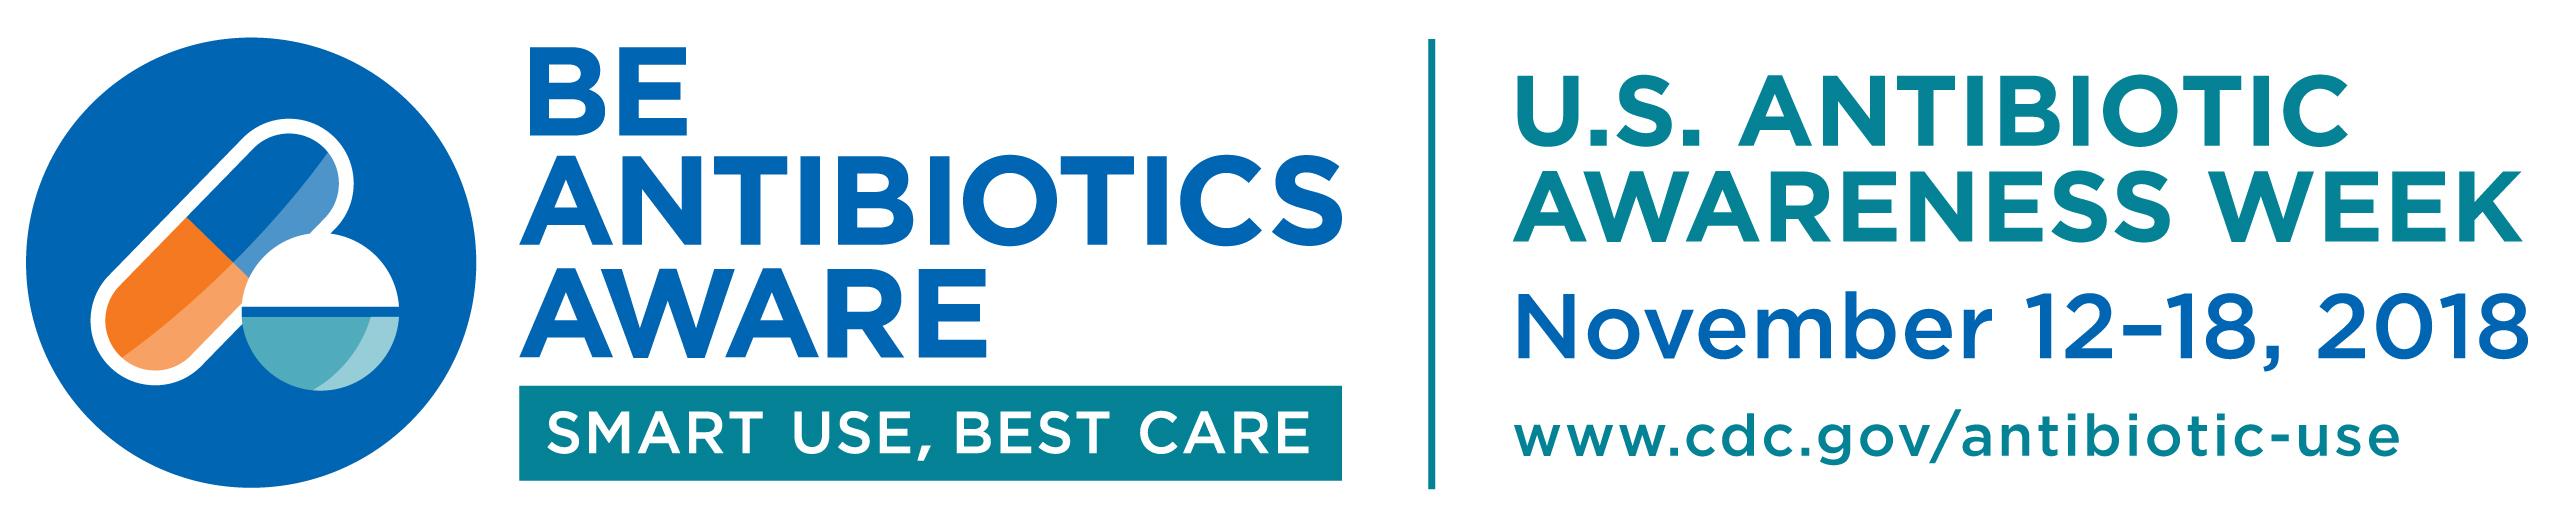 Be anitiotics aware : smart use, best care : U.S. Antibiotic Awareness Week : November 12-18, 2018